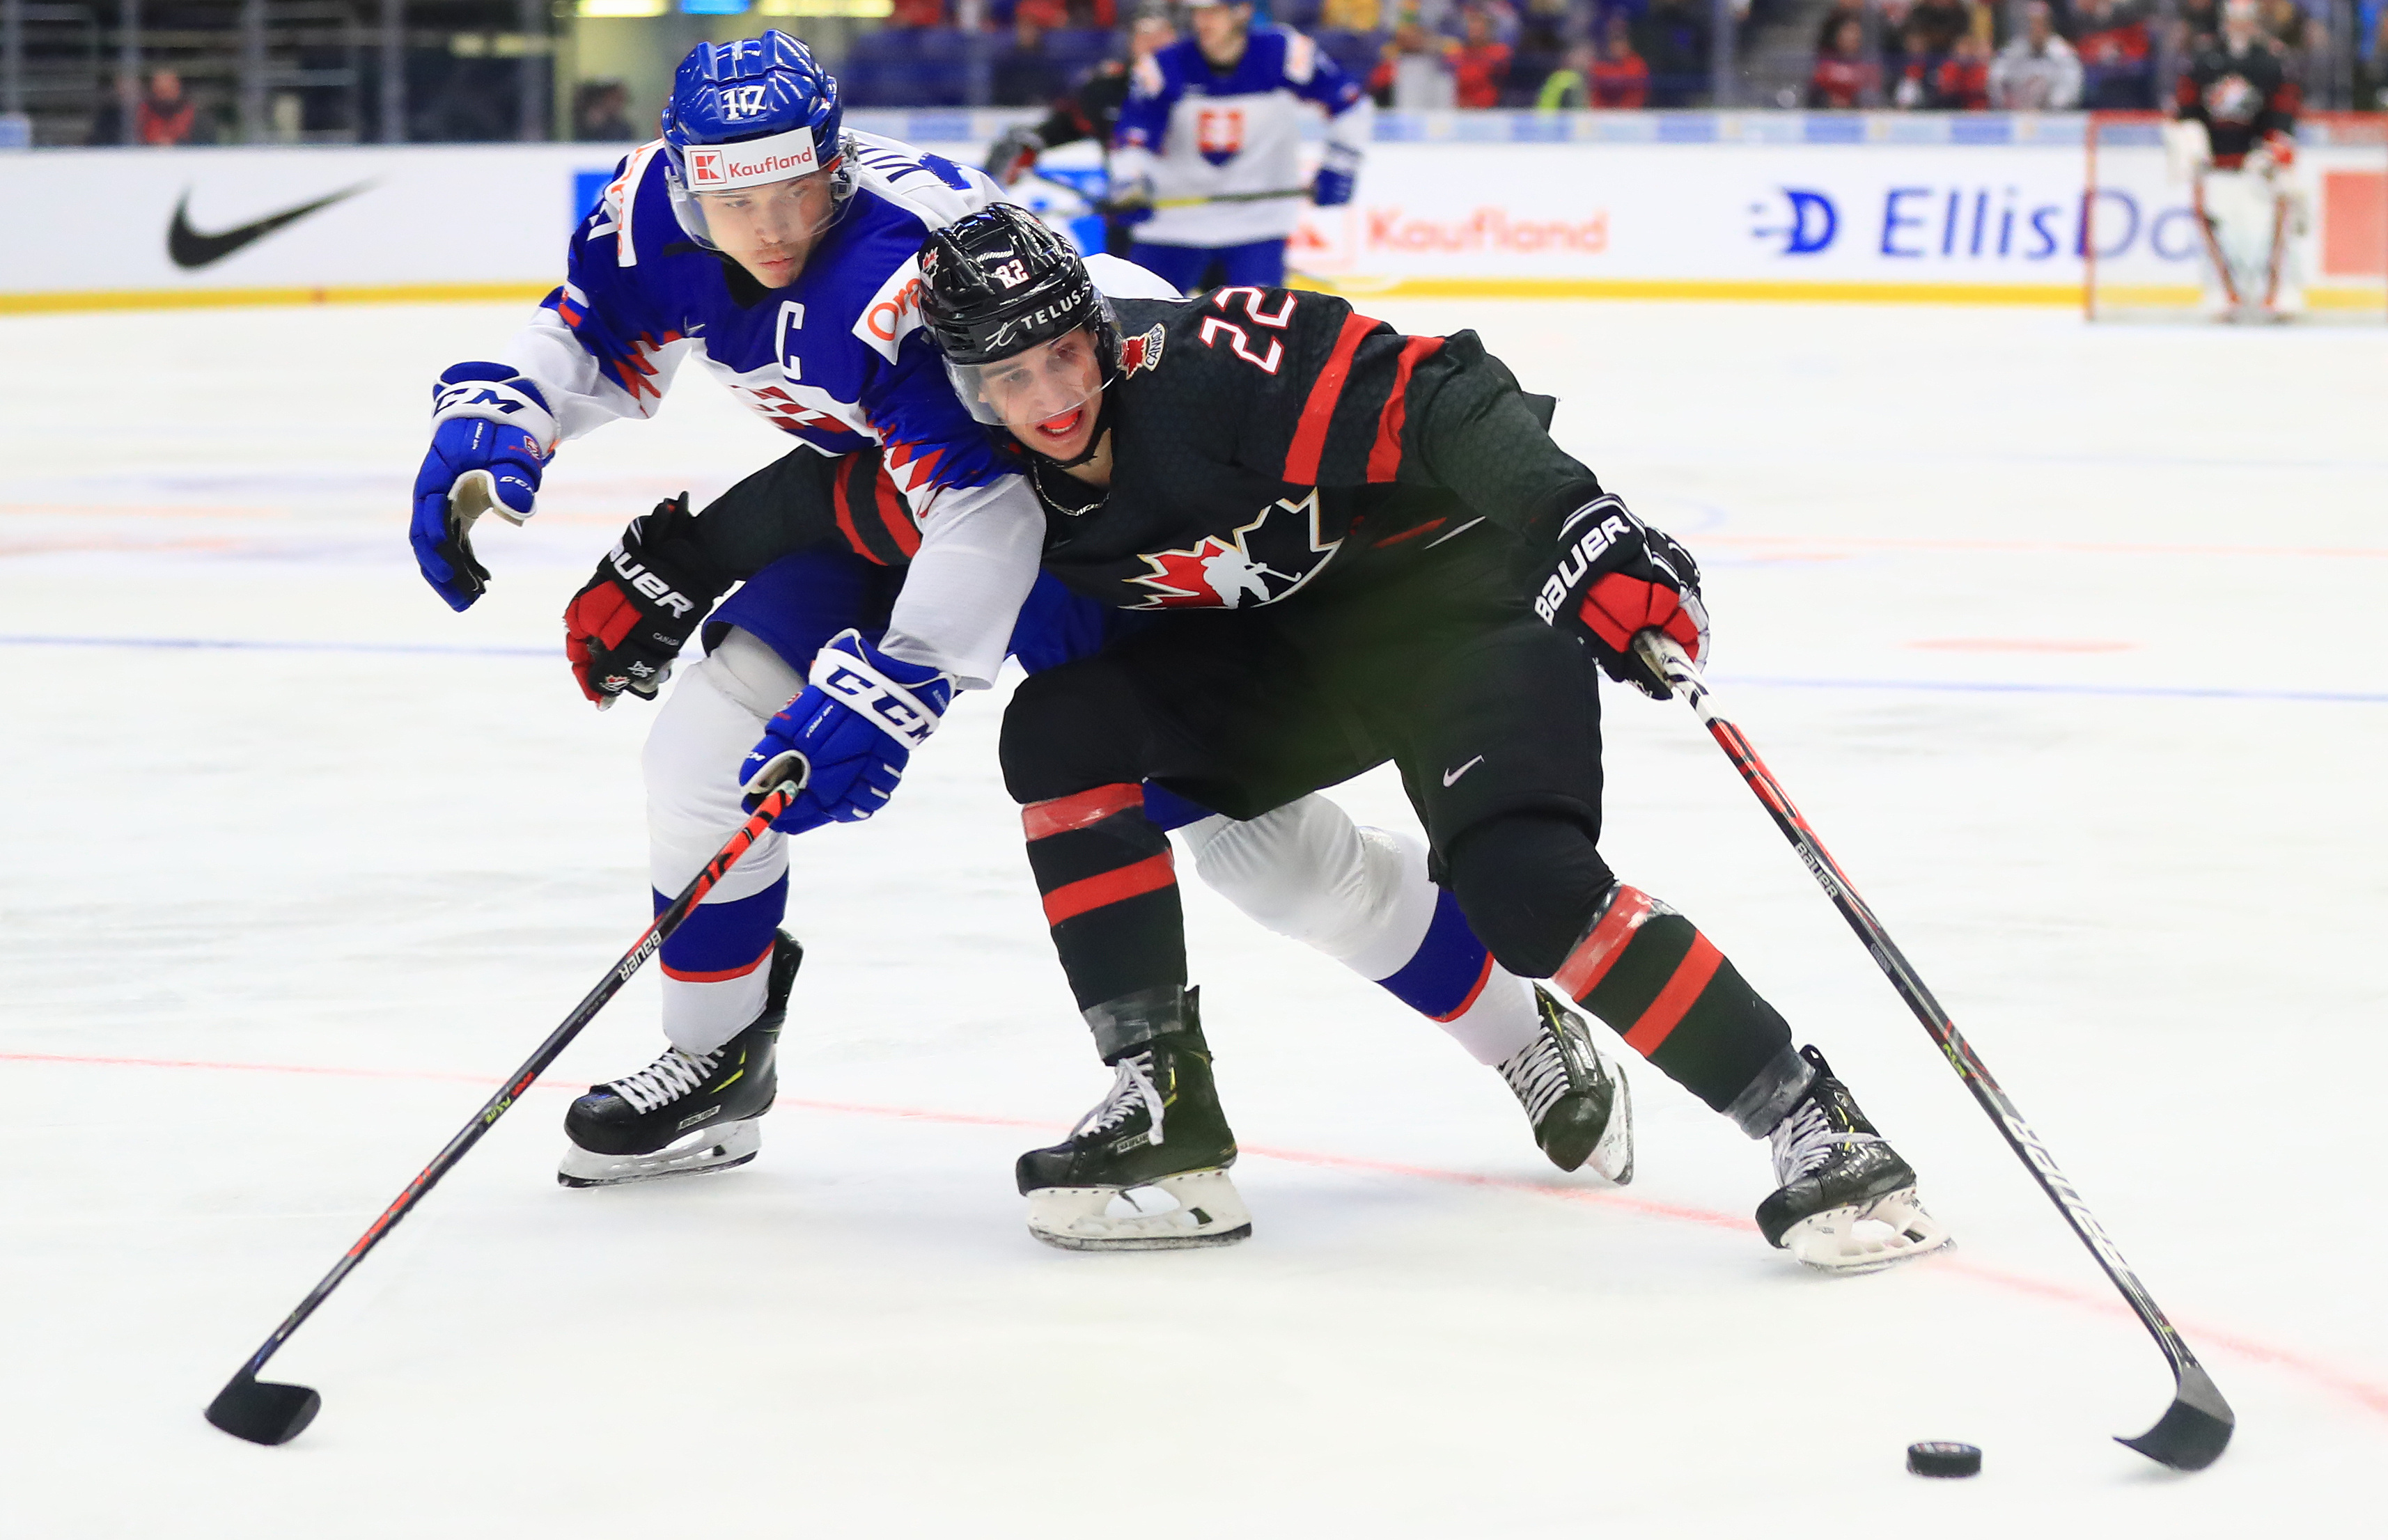 2020 IIHF World U20 Championship, quarter-finals: Canada vs Slovakia